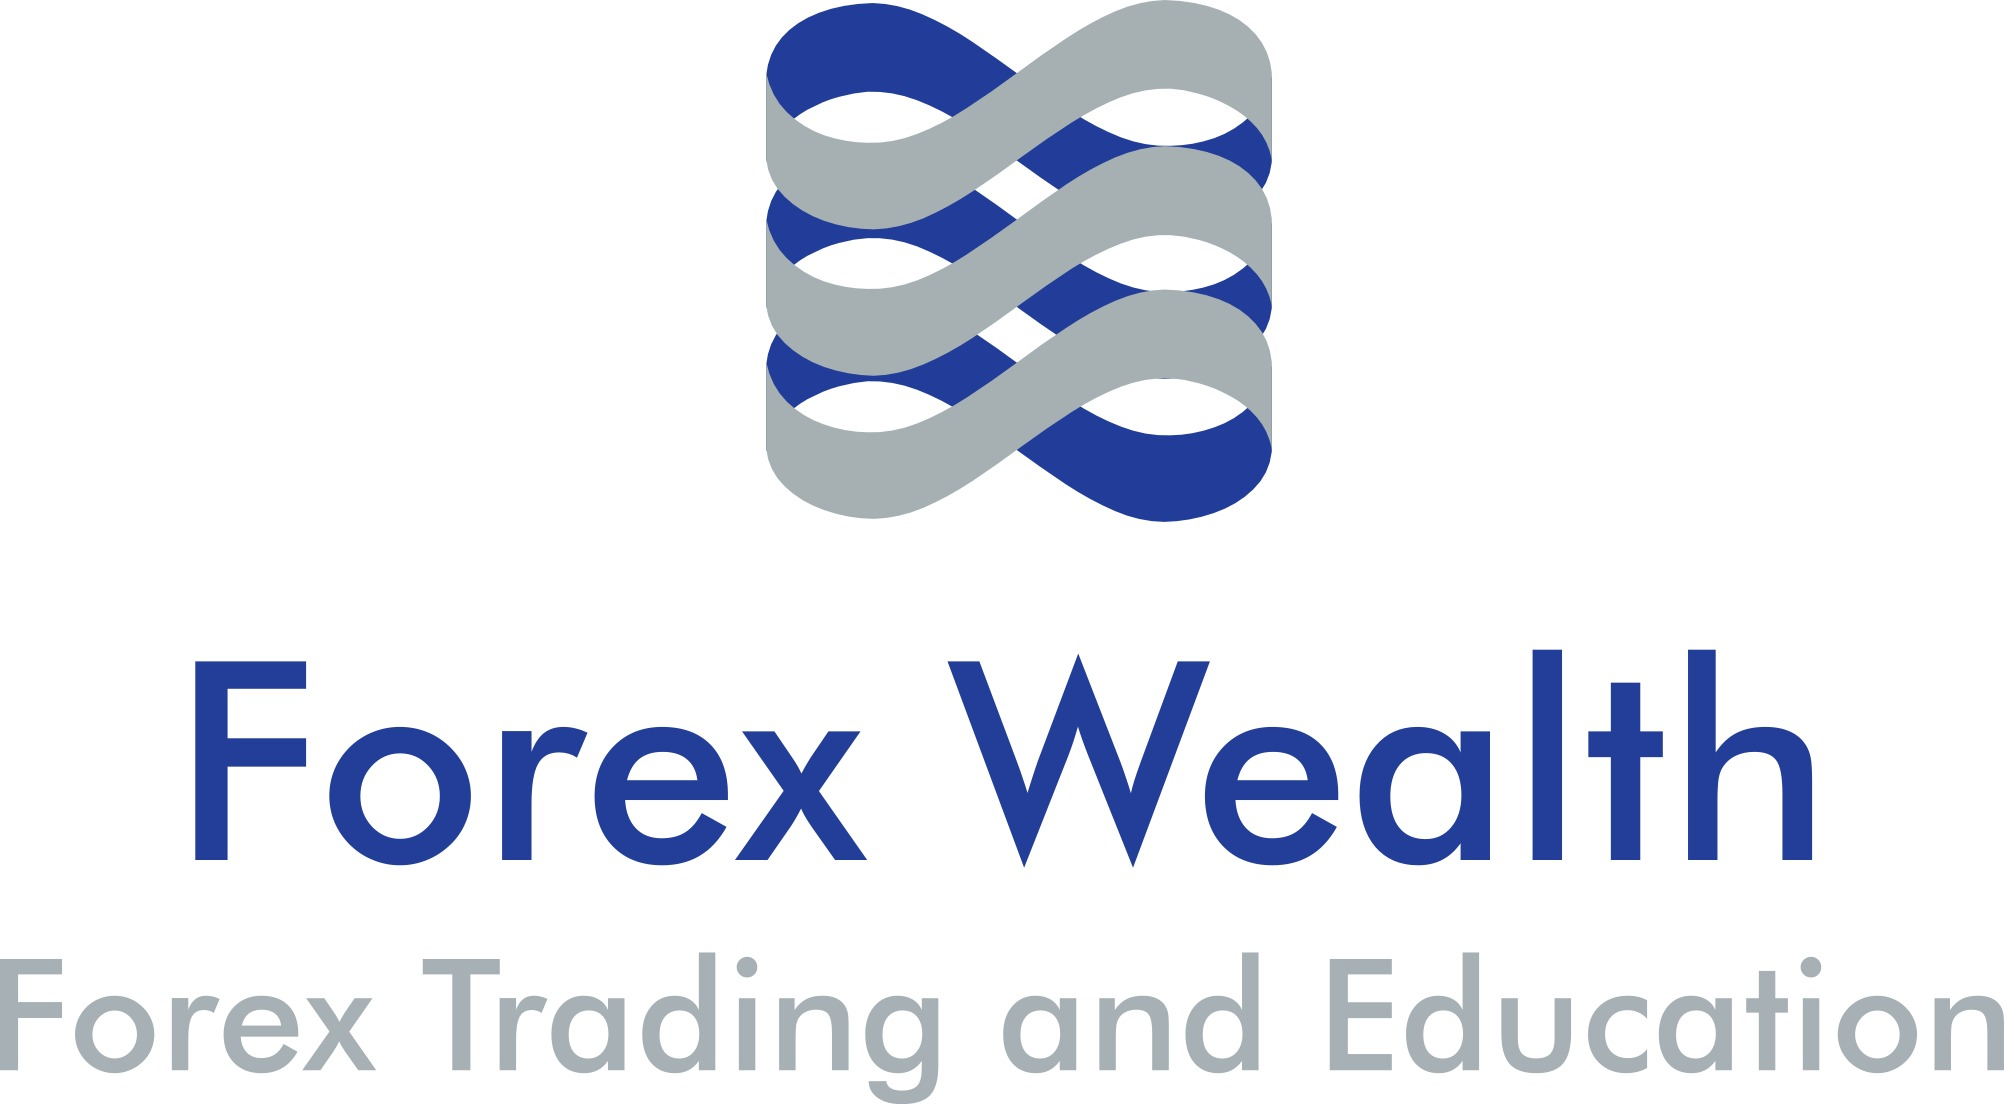 Forex wealth